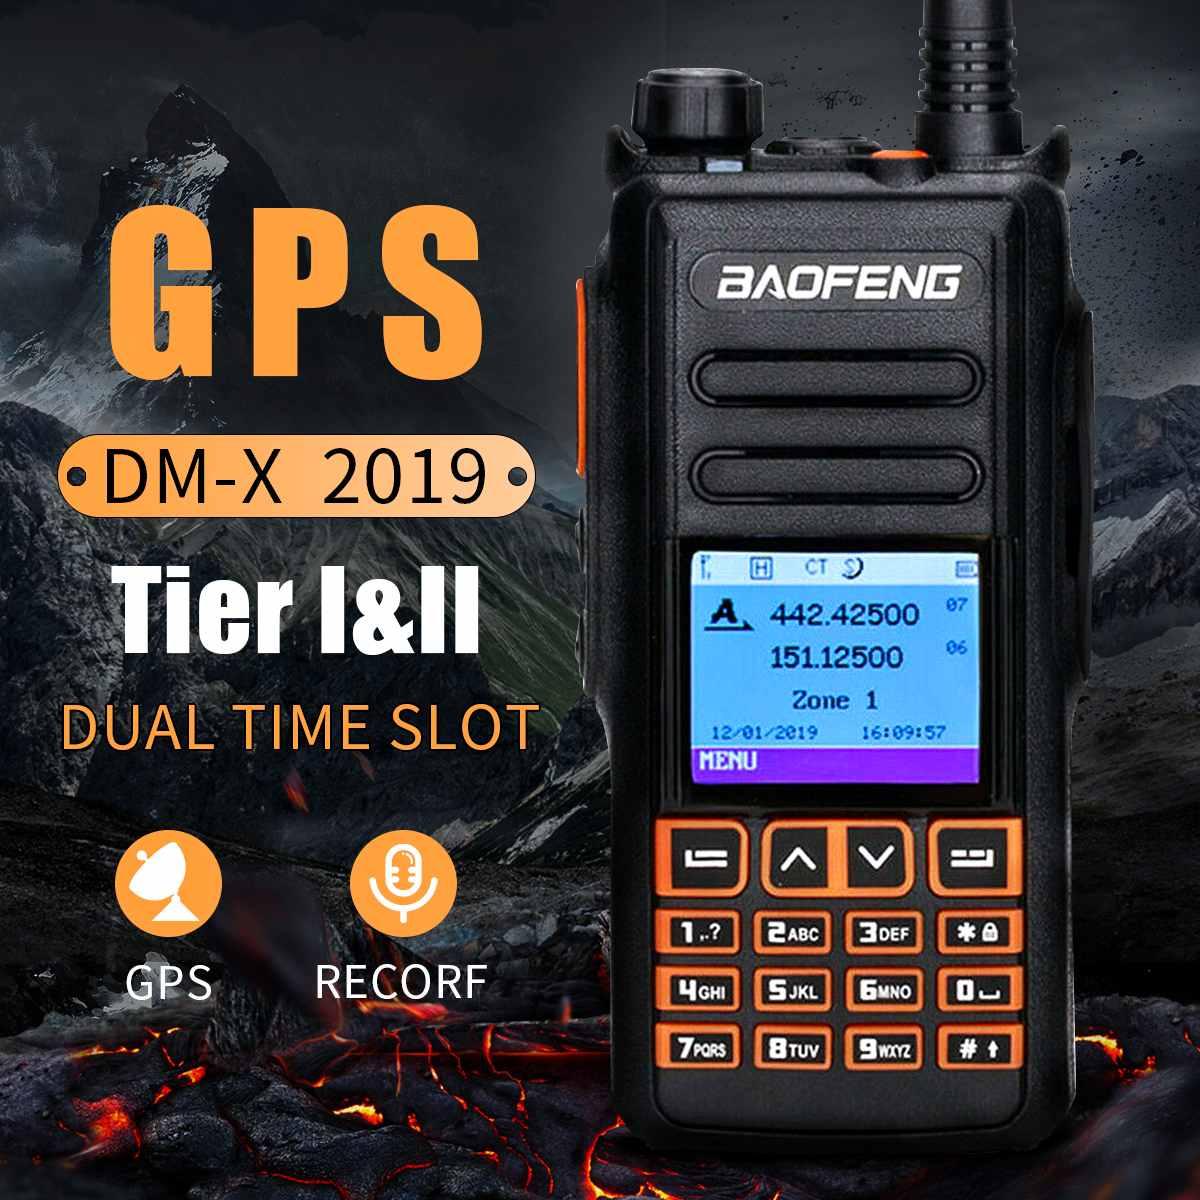 2019 Baofeng DM-X Digital Walkie Talkie GPS Record Tier 1&2 Dual Band Dual Time Slot DMR Digital/Analog Repeater Upgrade DM-1702